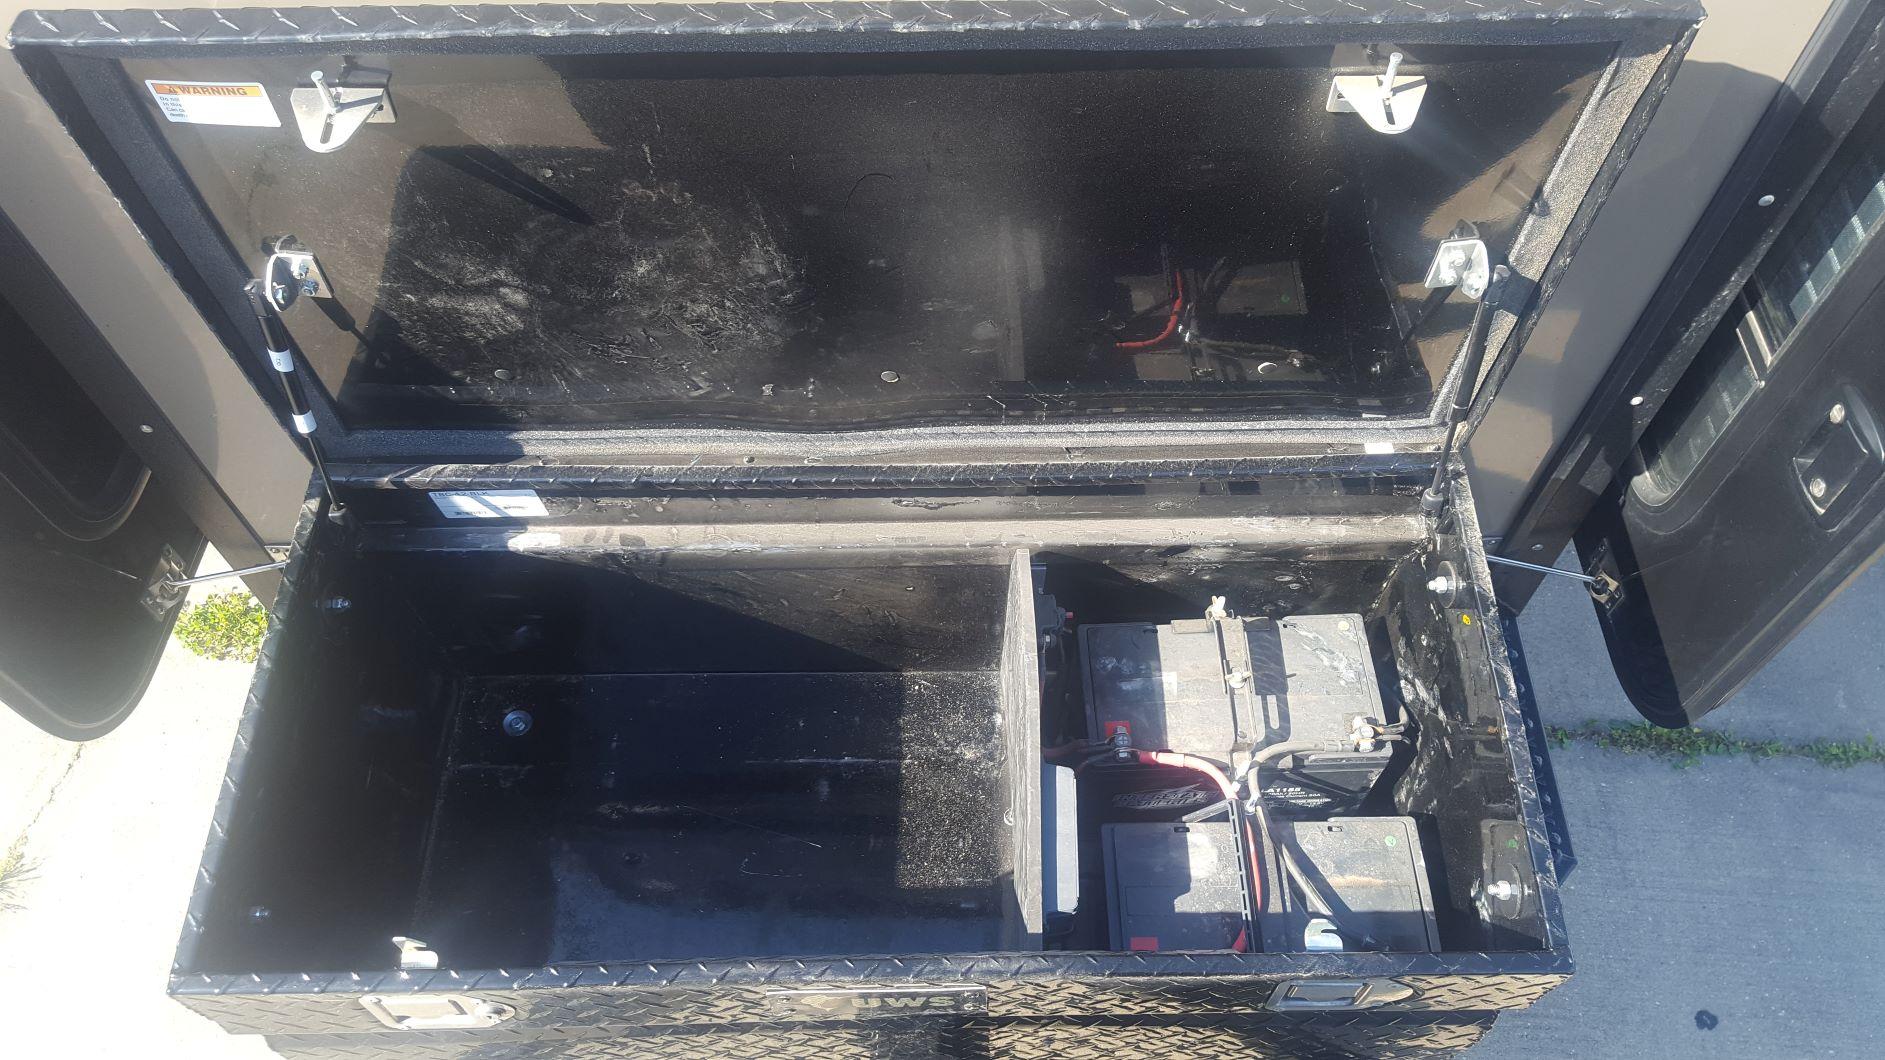 F_Toolbox batteries.jpg